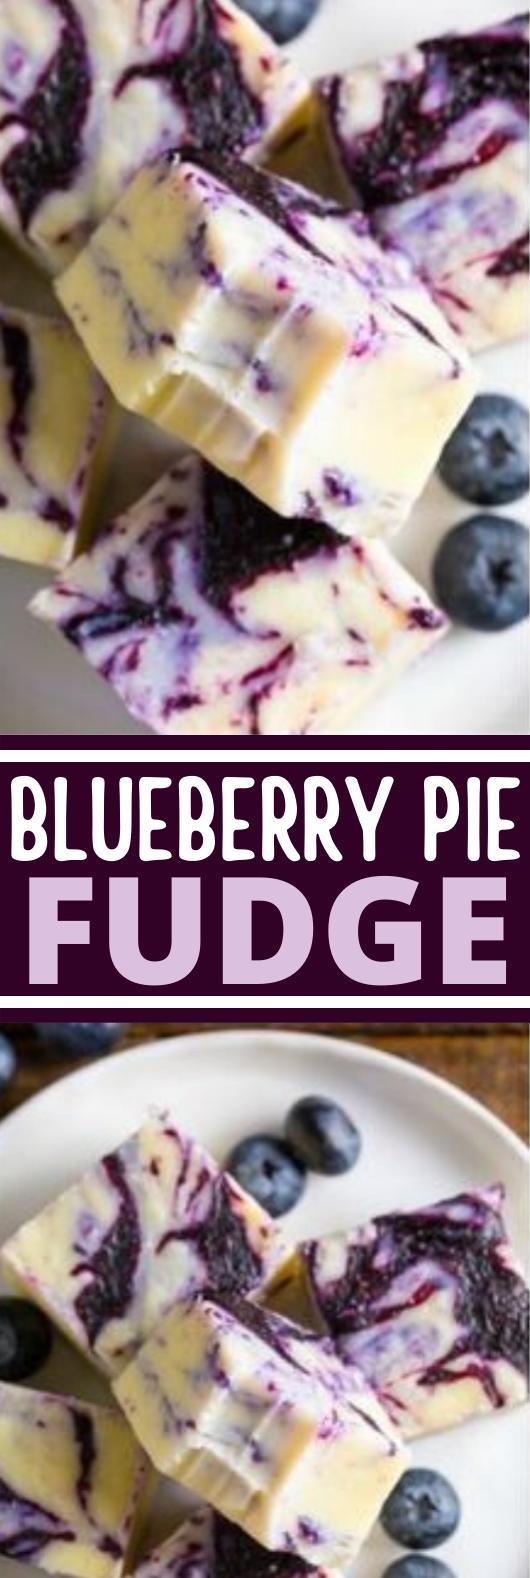 Blueberry Pie Fudge #dessert #recipes #nobake #chocolate #fudge